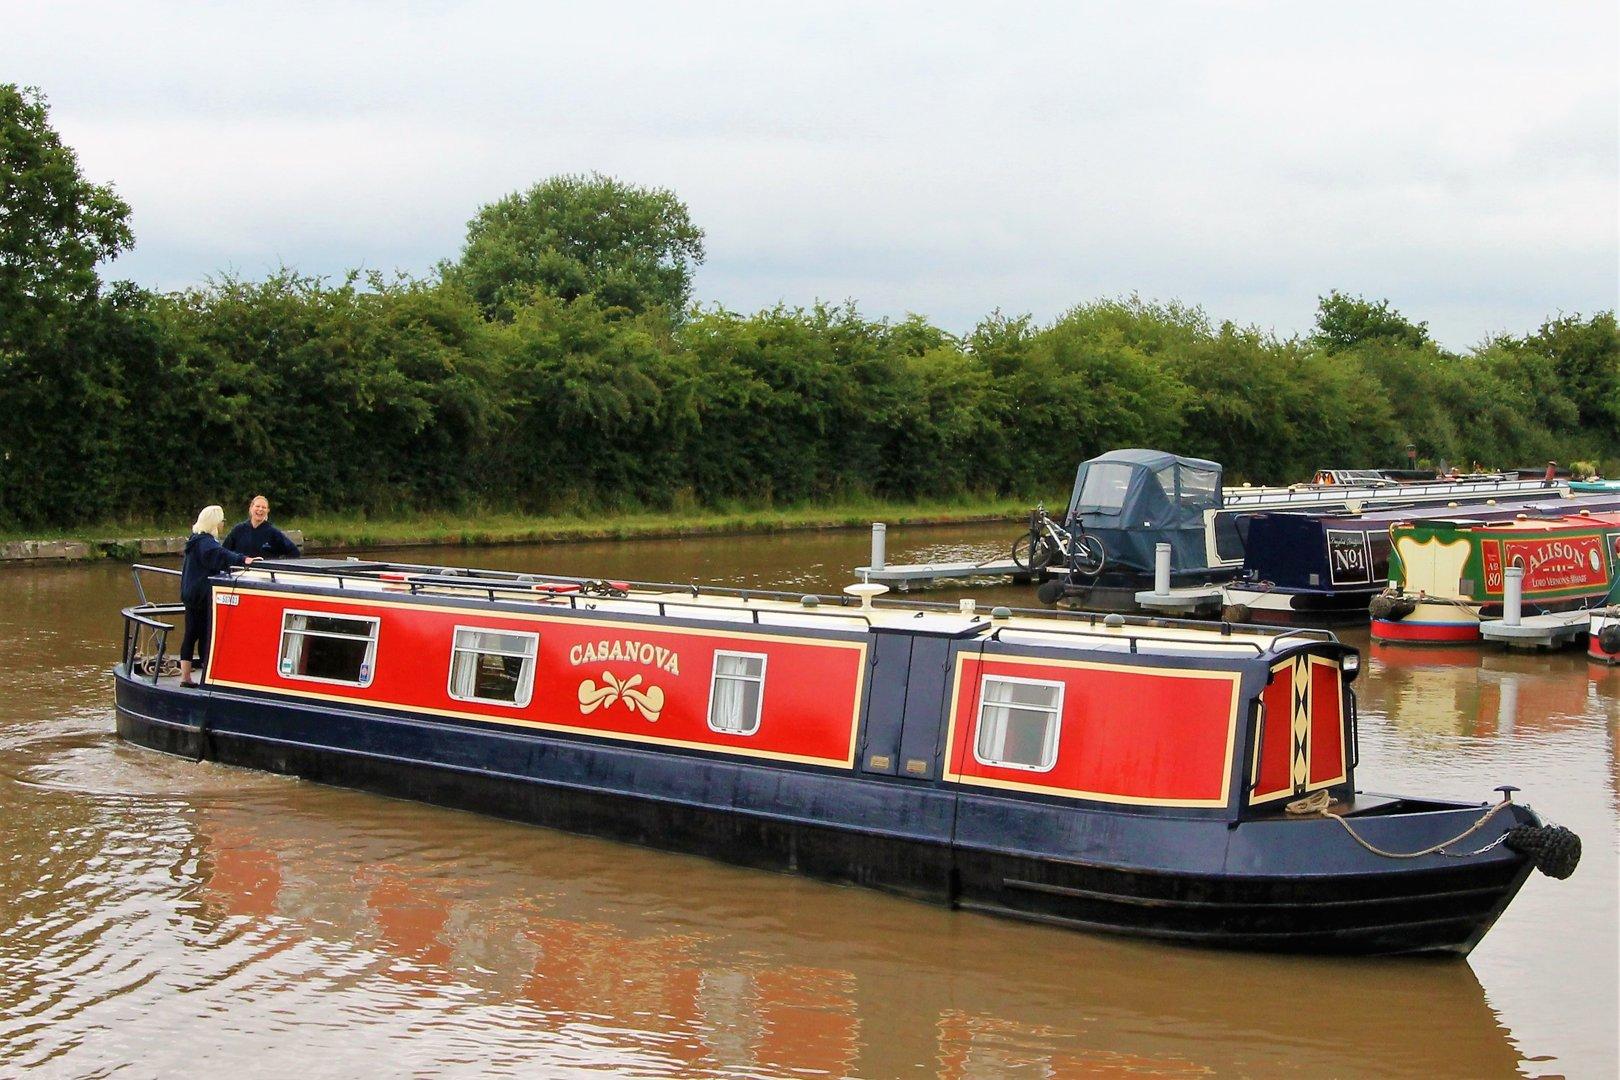 The Casanova class canal boat